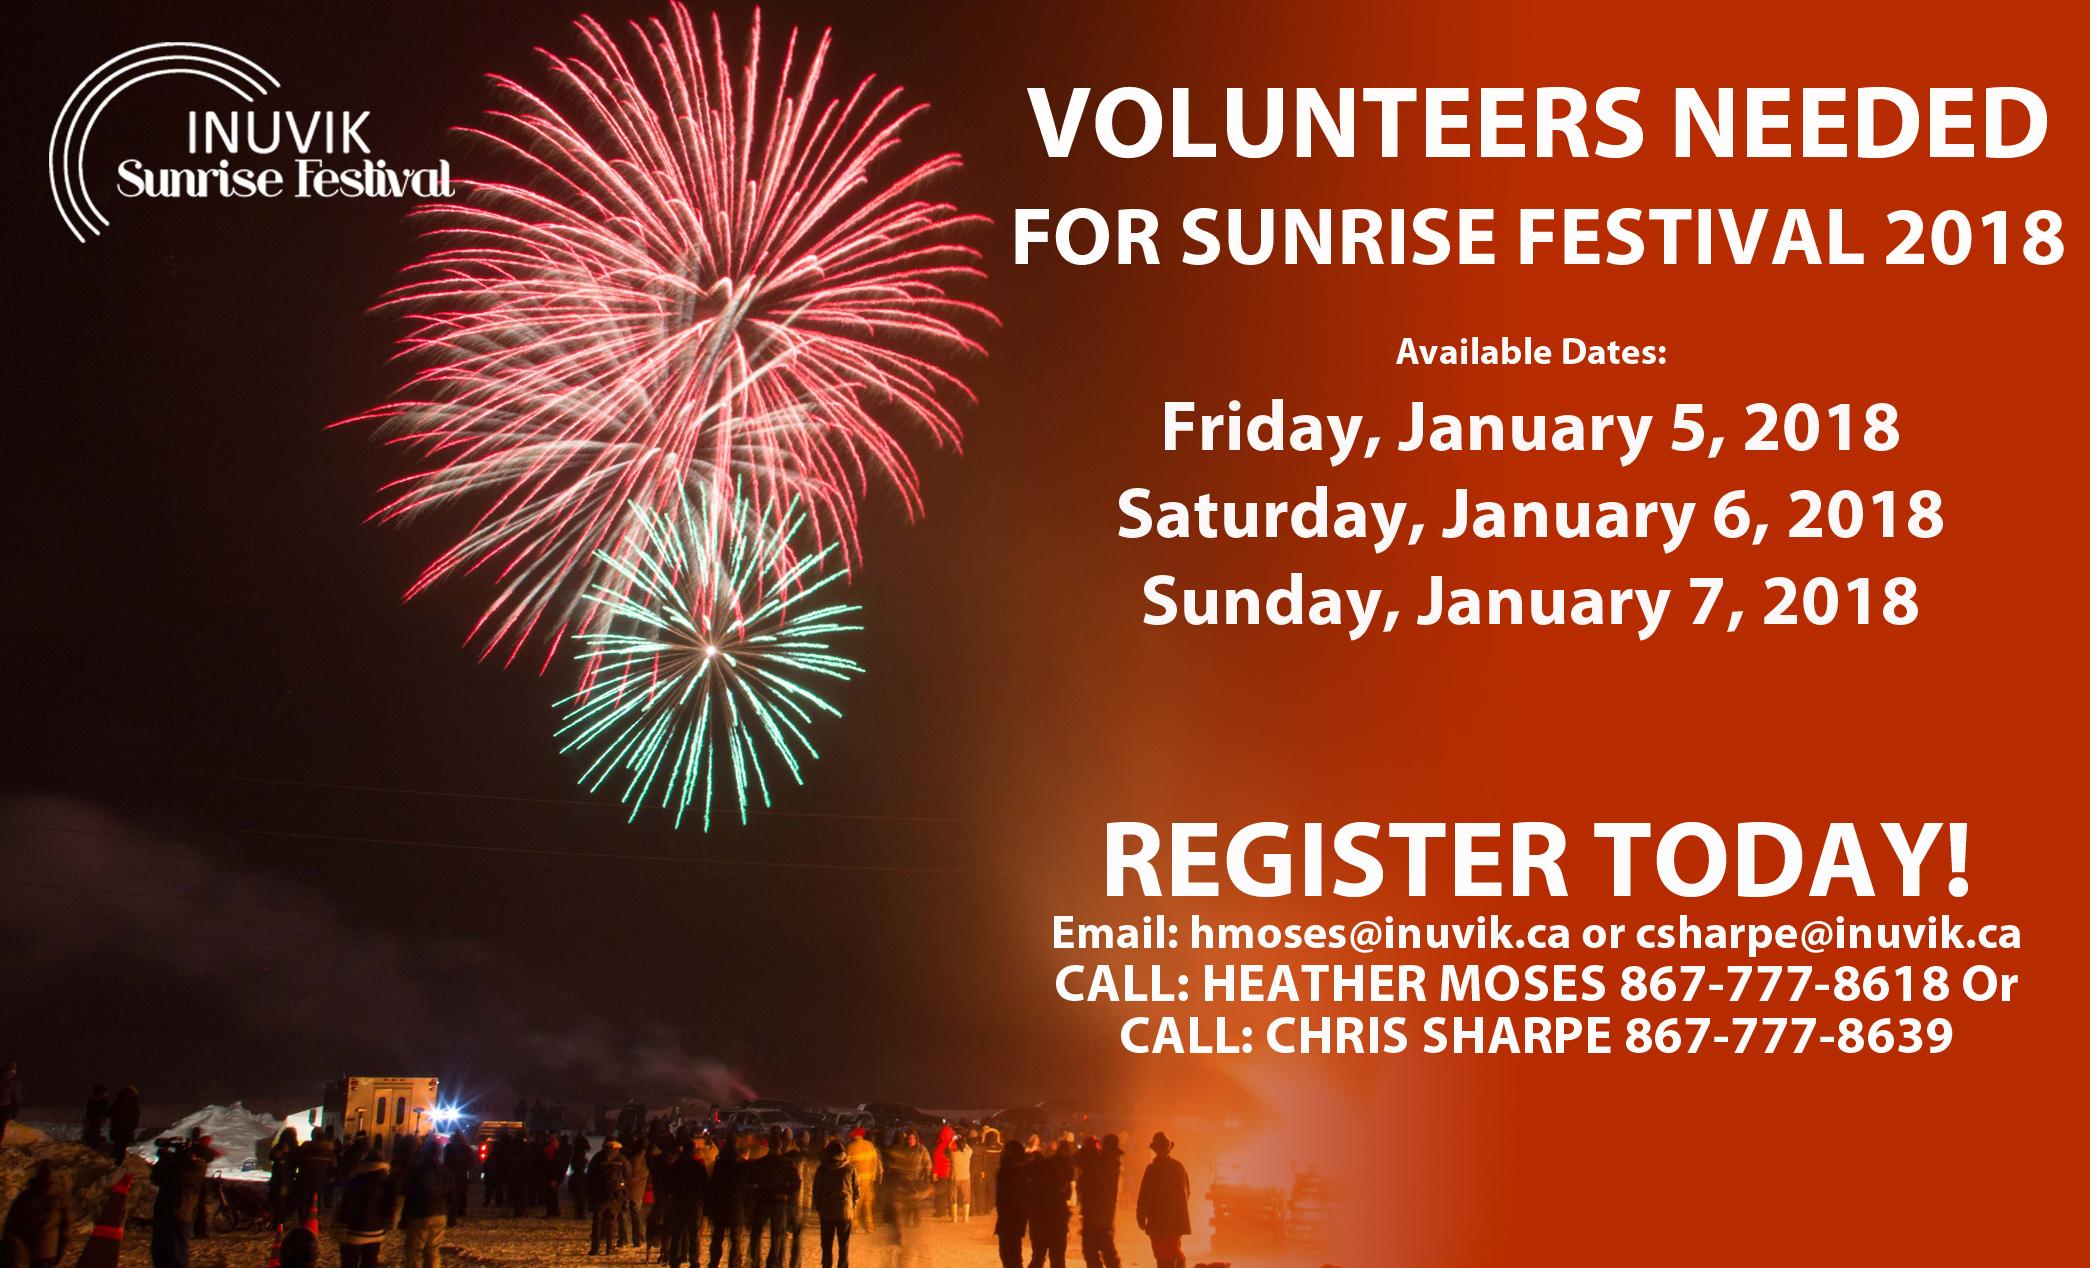 VOLUNTEERS NEEDED FOR SUNRISE FESTIVAL 2018